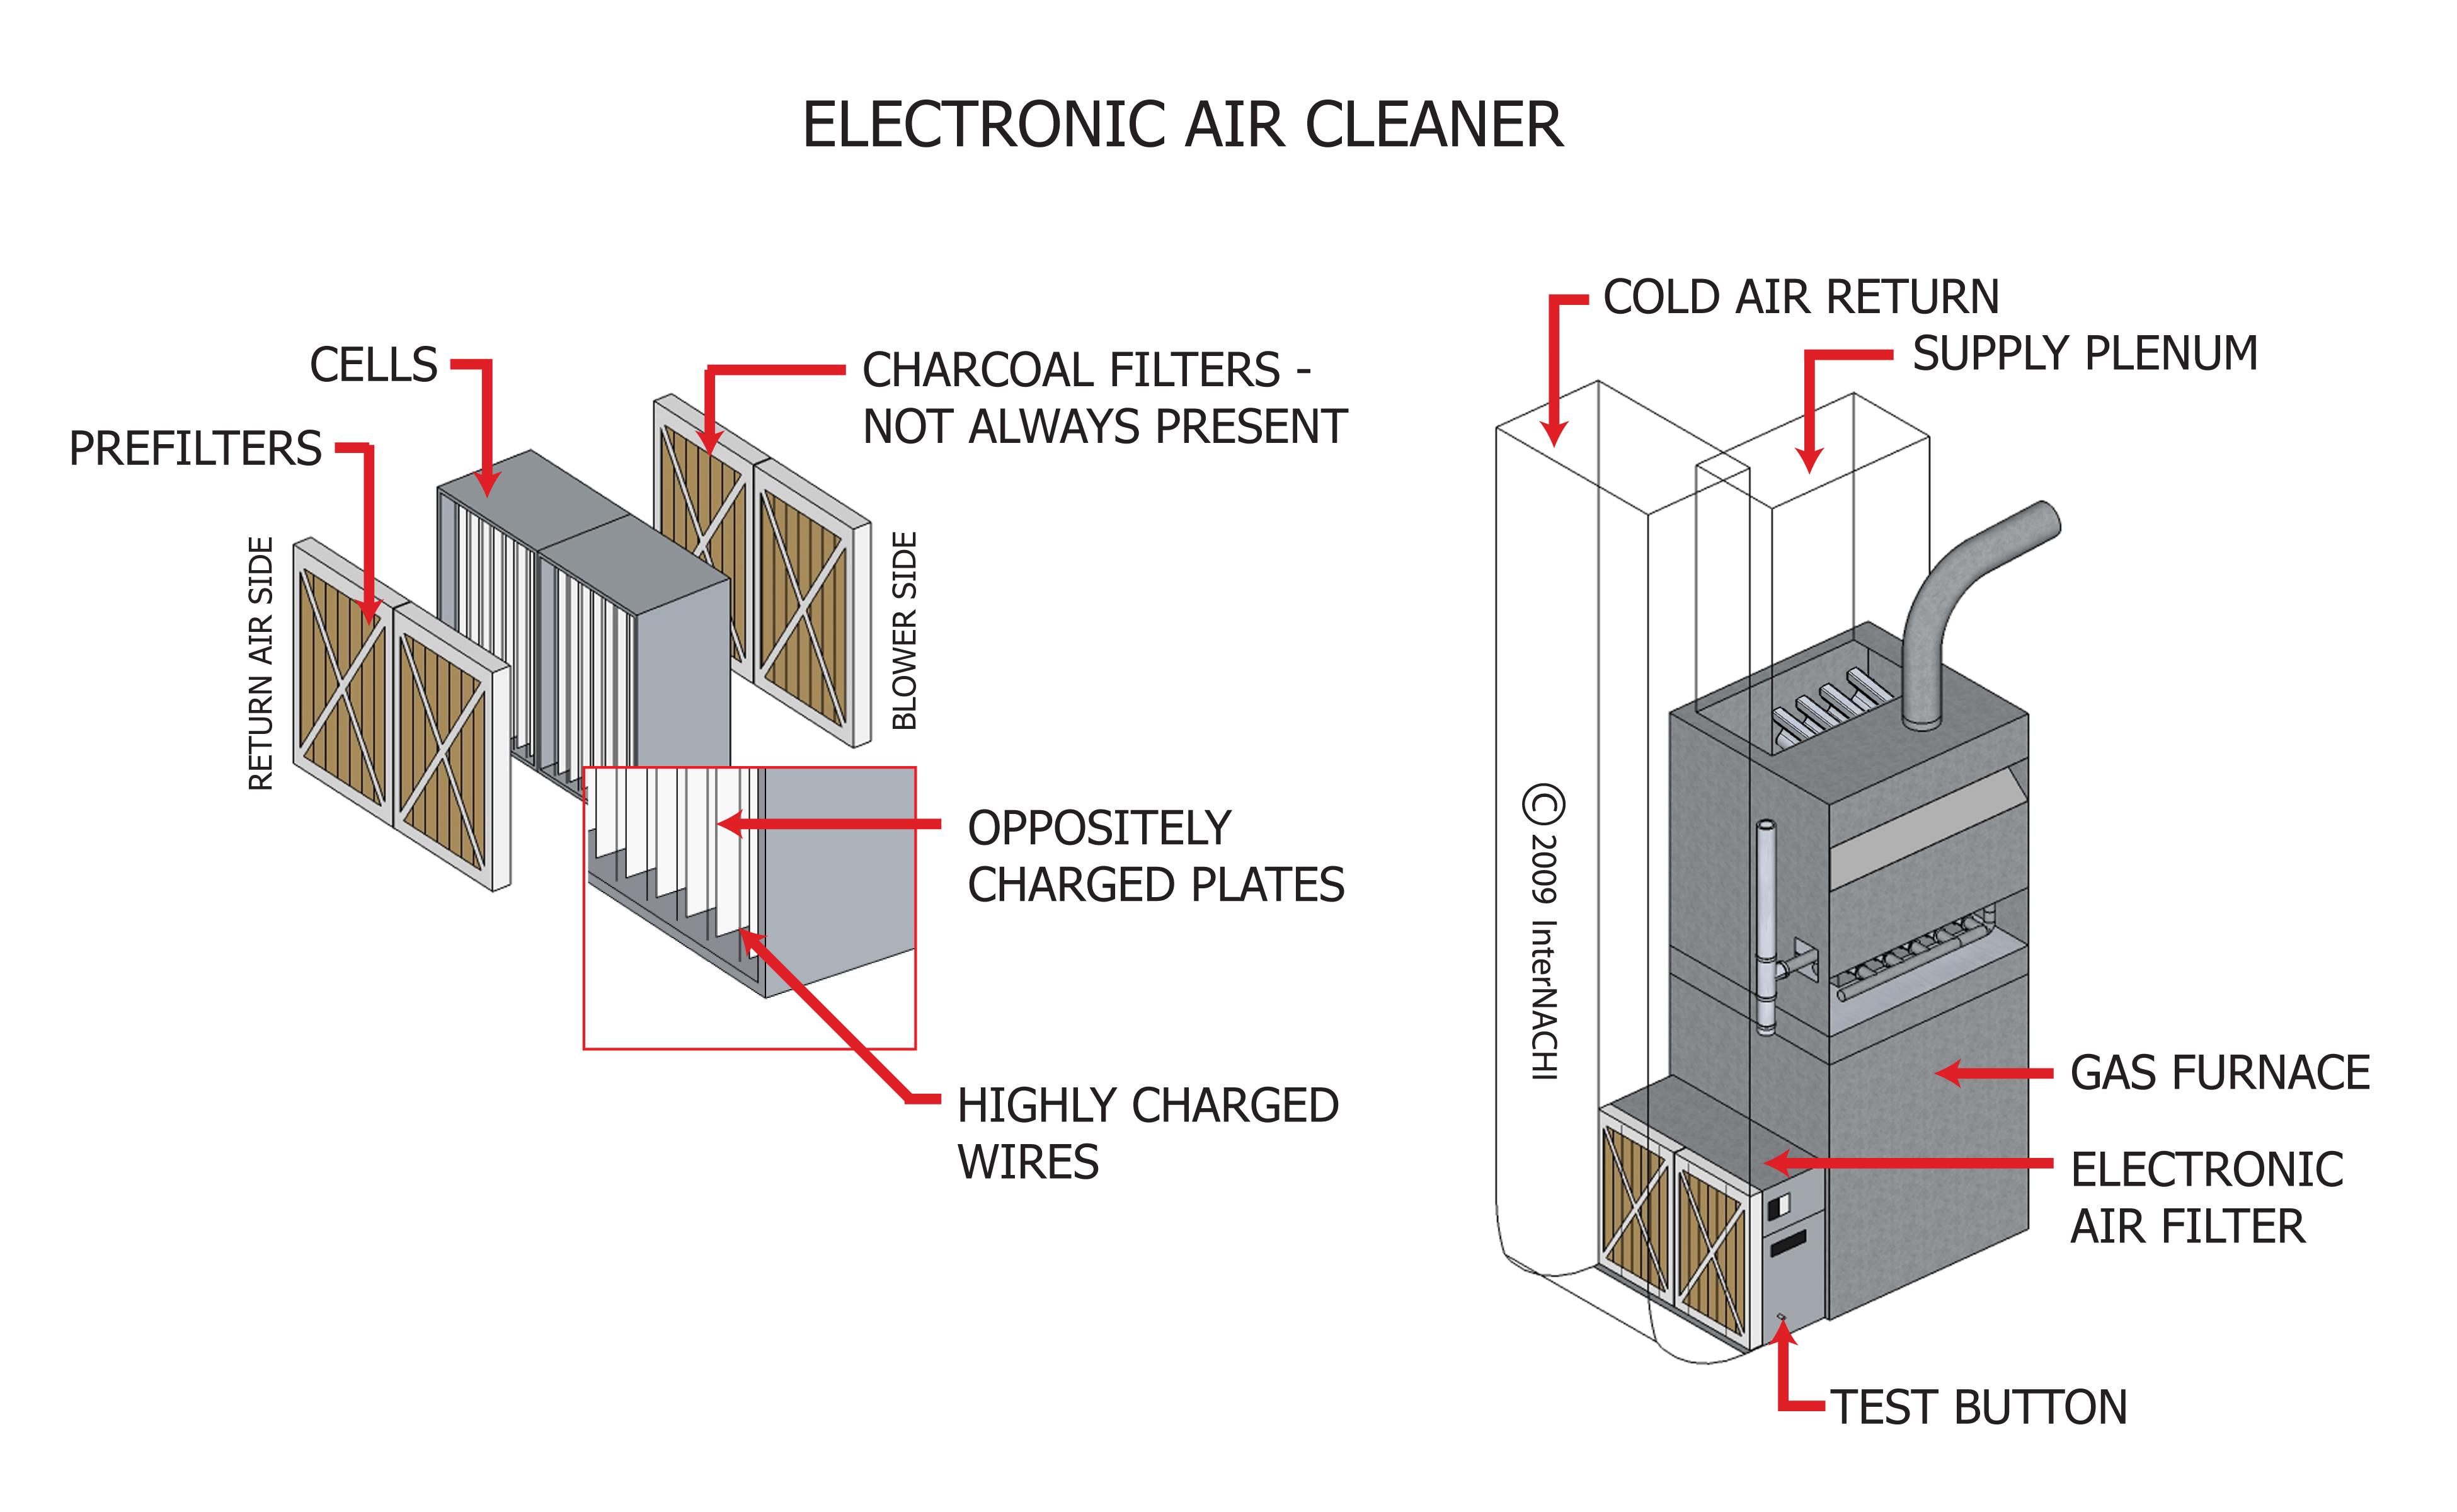 internachi inspection graphics library hvac general electronicinternachi inspection graphics library hvac general electronic air cleaner jpg